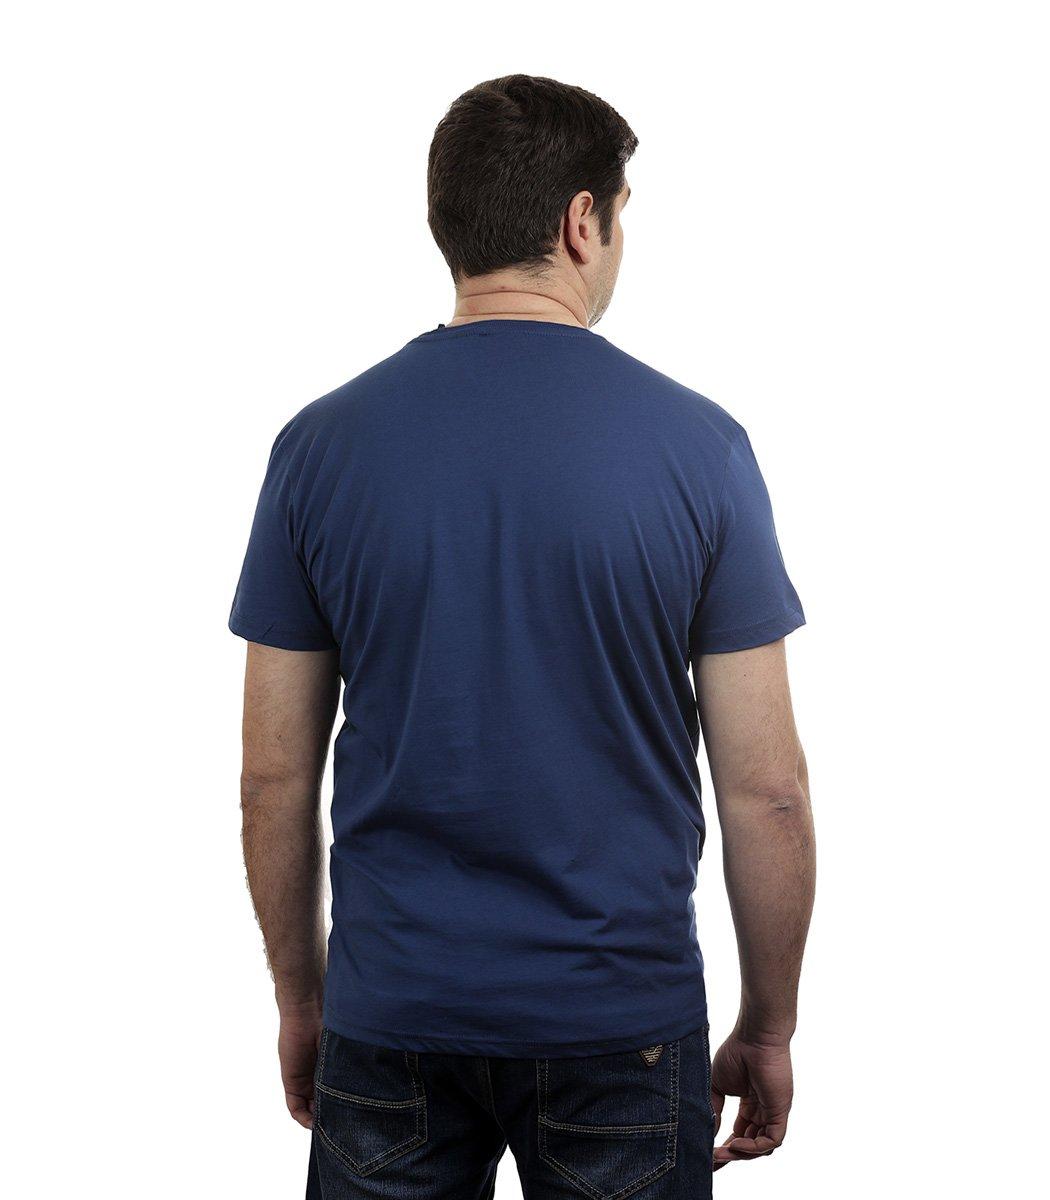 Синяя футболка Napapijri - Синий - Вид 3